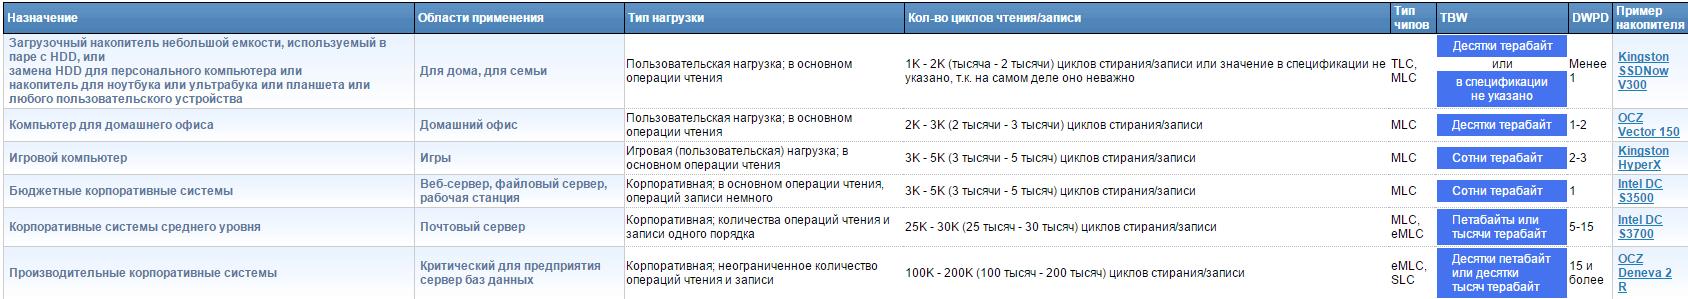 Таблица области применения ssd